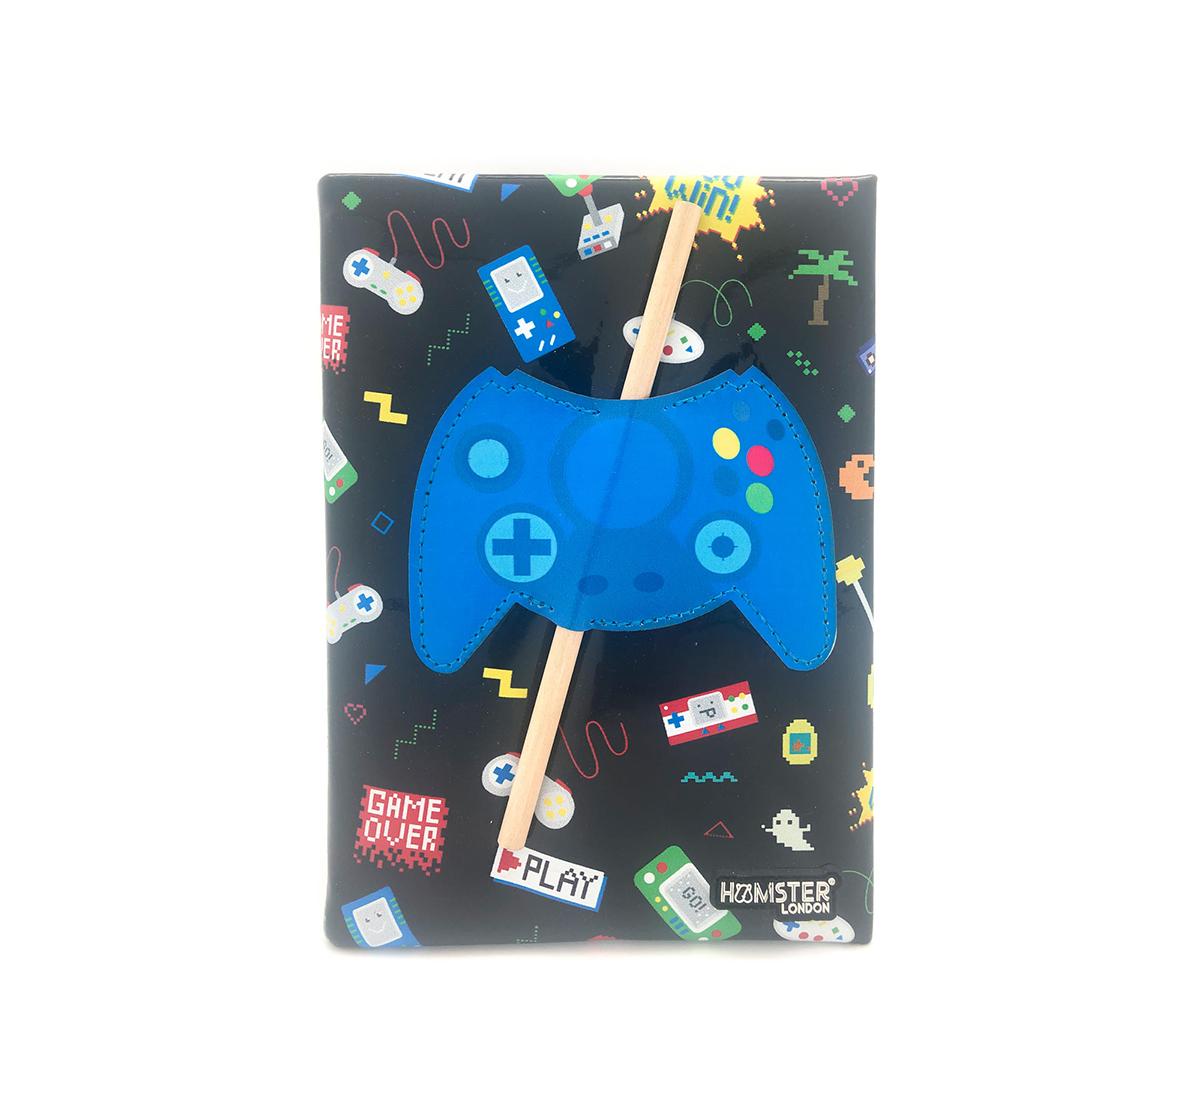 Hamster London   Hamster London Gamer Diary for Kids age 3Y+ (Blue)